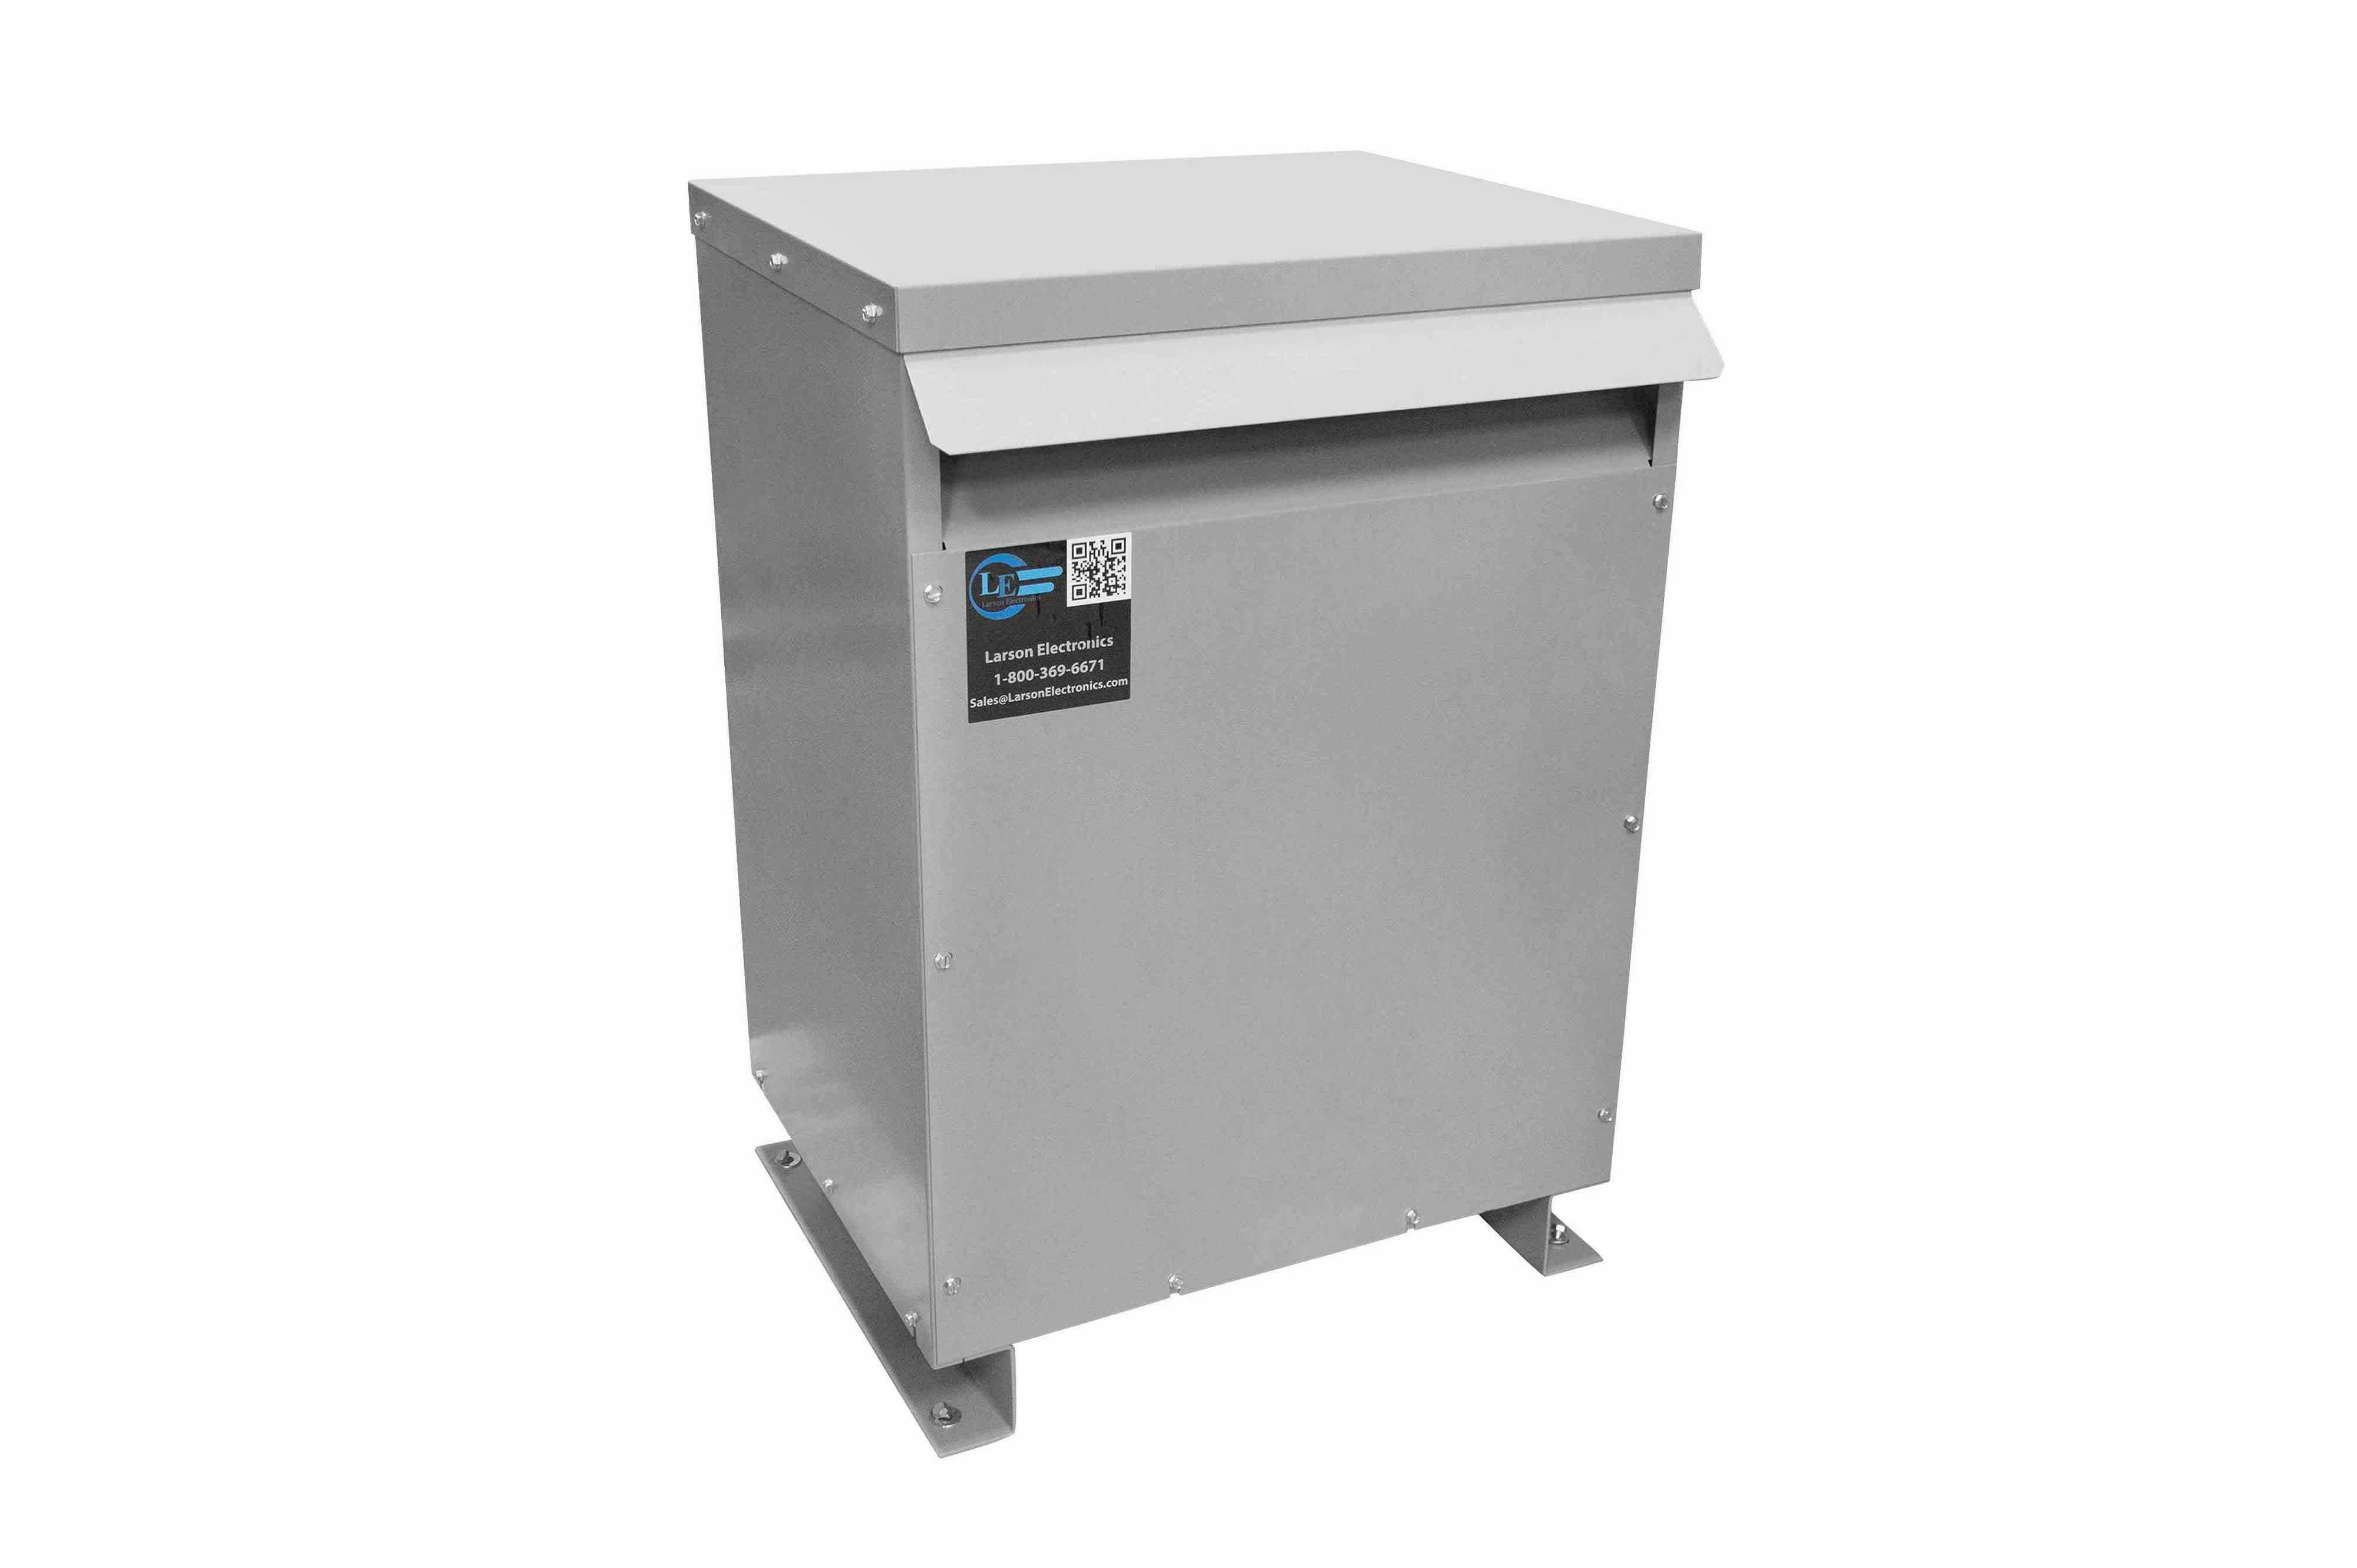 110 kVA 3PH Isolation Transformer, 460V Wye Primary, 240V/120 Delta Secondary, N3R, Ventilated, 60 Hz